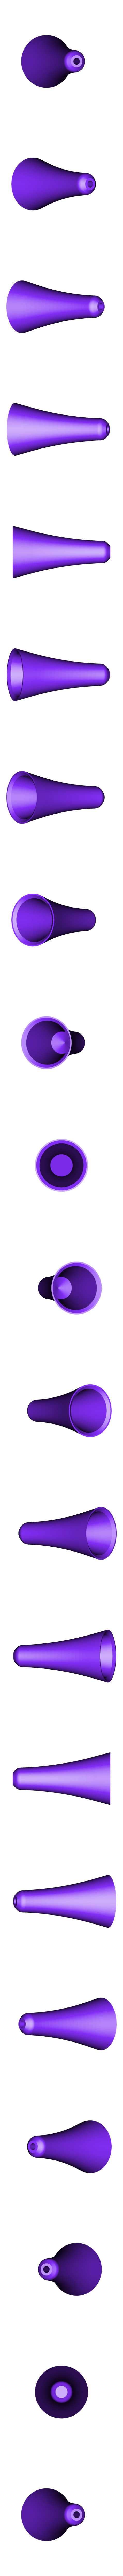 DART_1.5MM_FINAL_102_1.stl Download free STL file Zombie Slayer (5 SHOT MAG) • 3D printer template, MuSSy